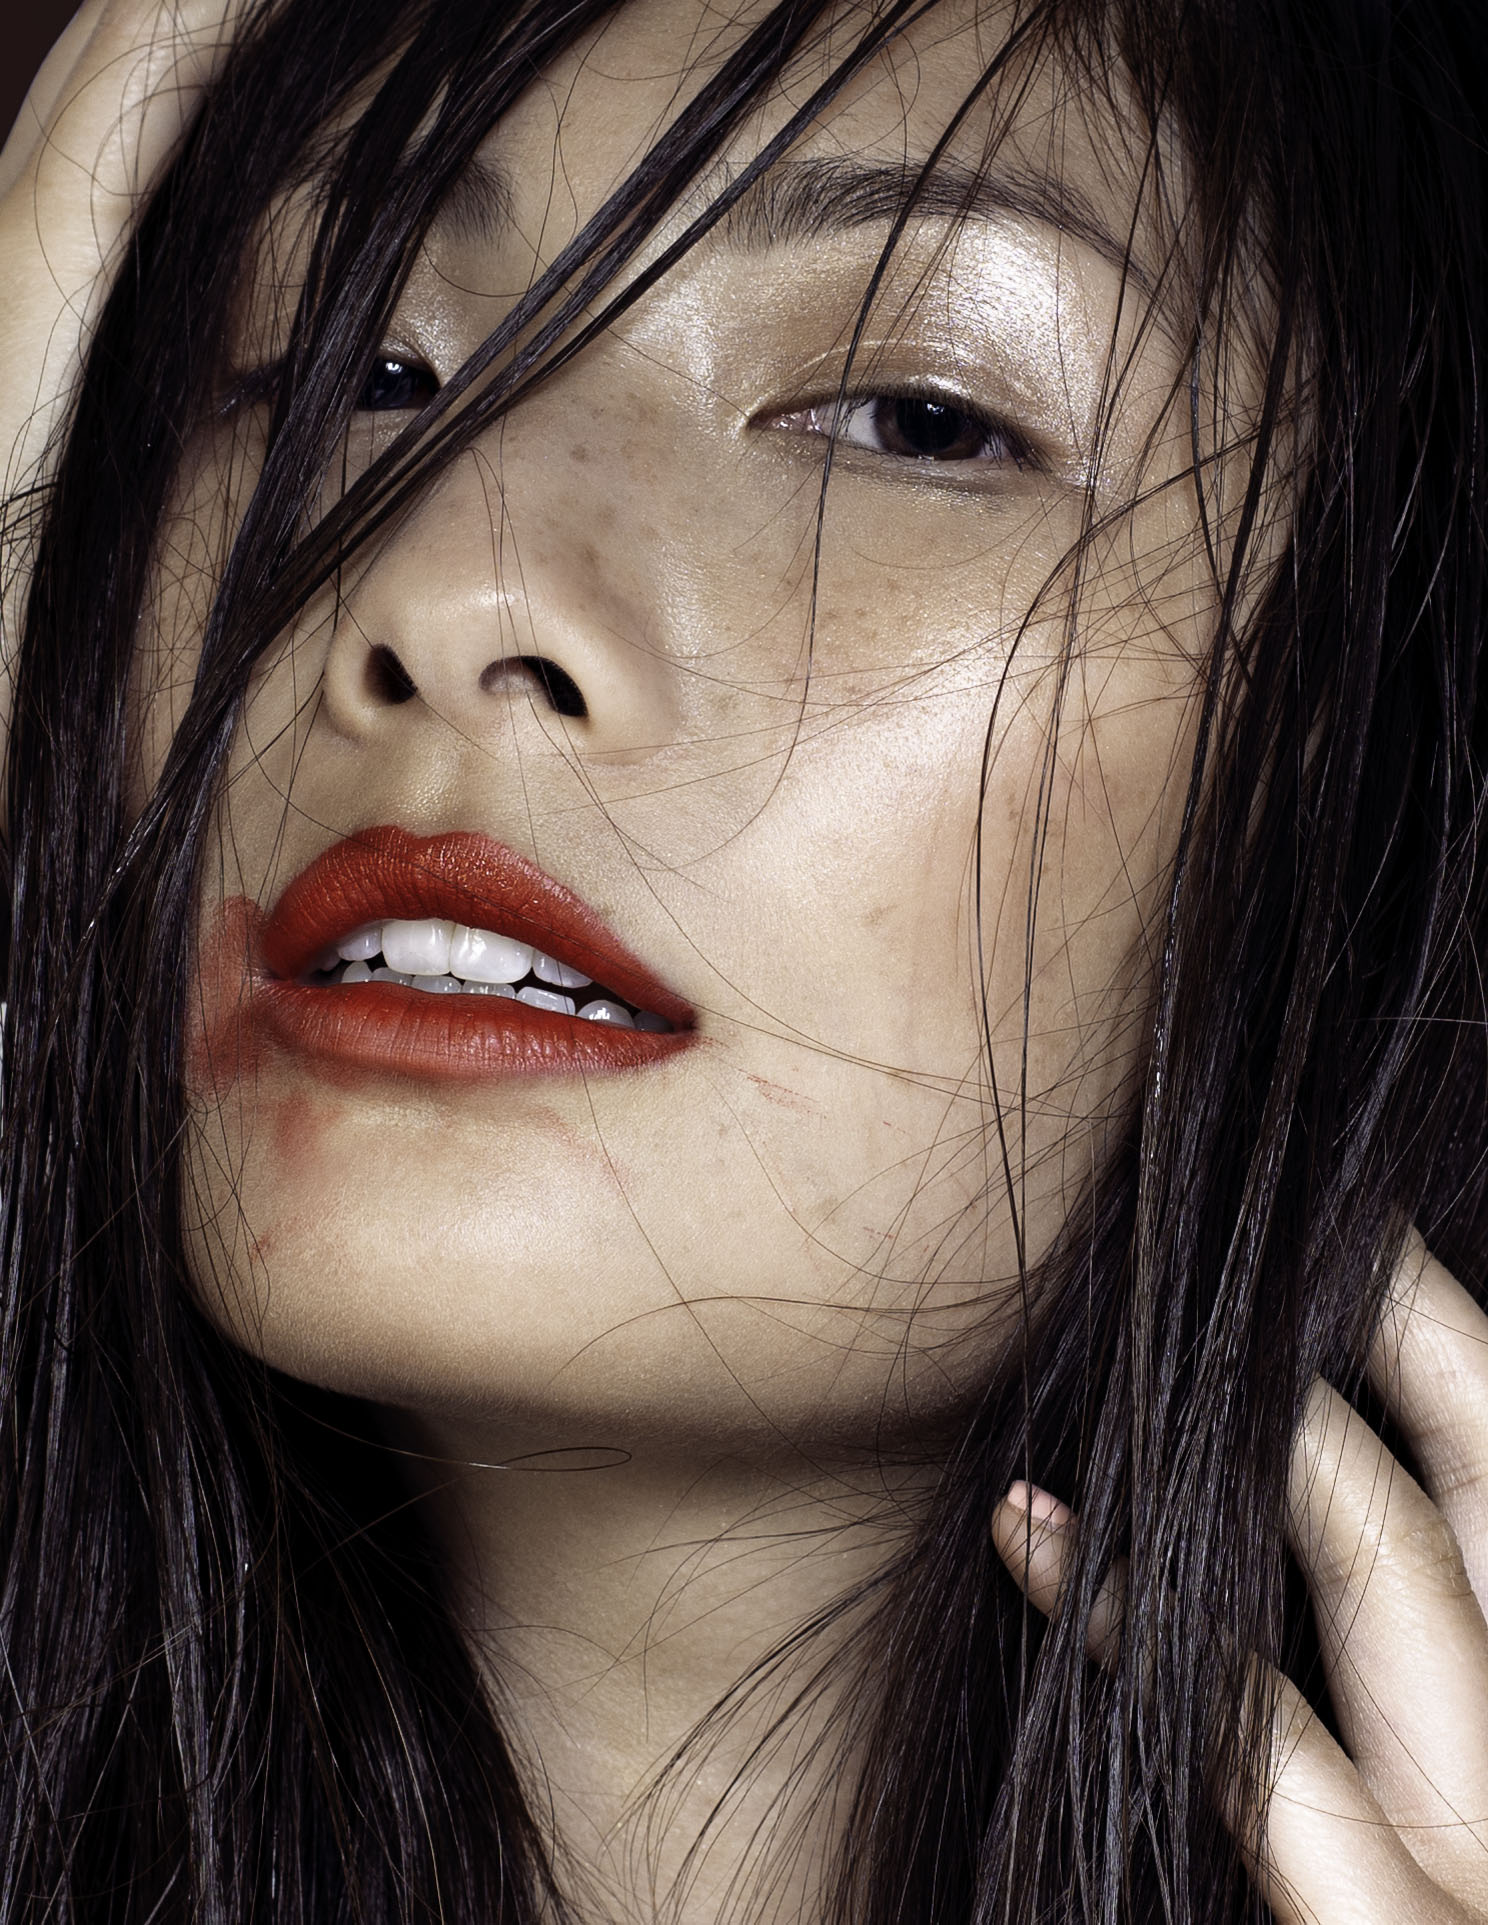 Beauty-Hue-Linh-162-Edit.jpg